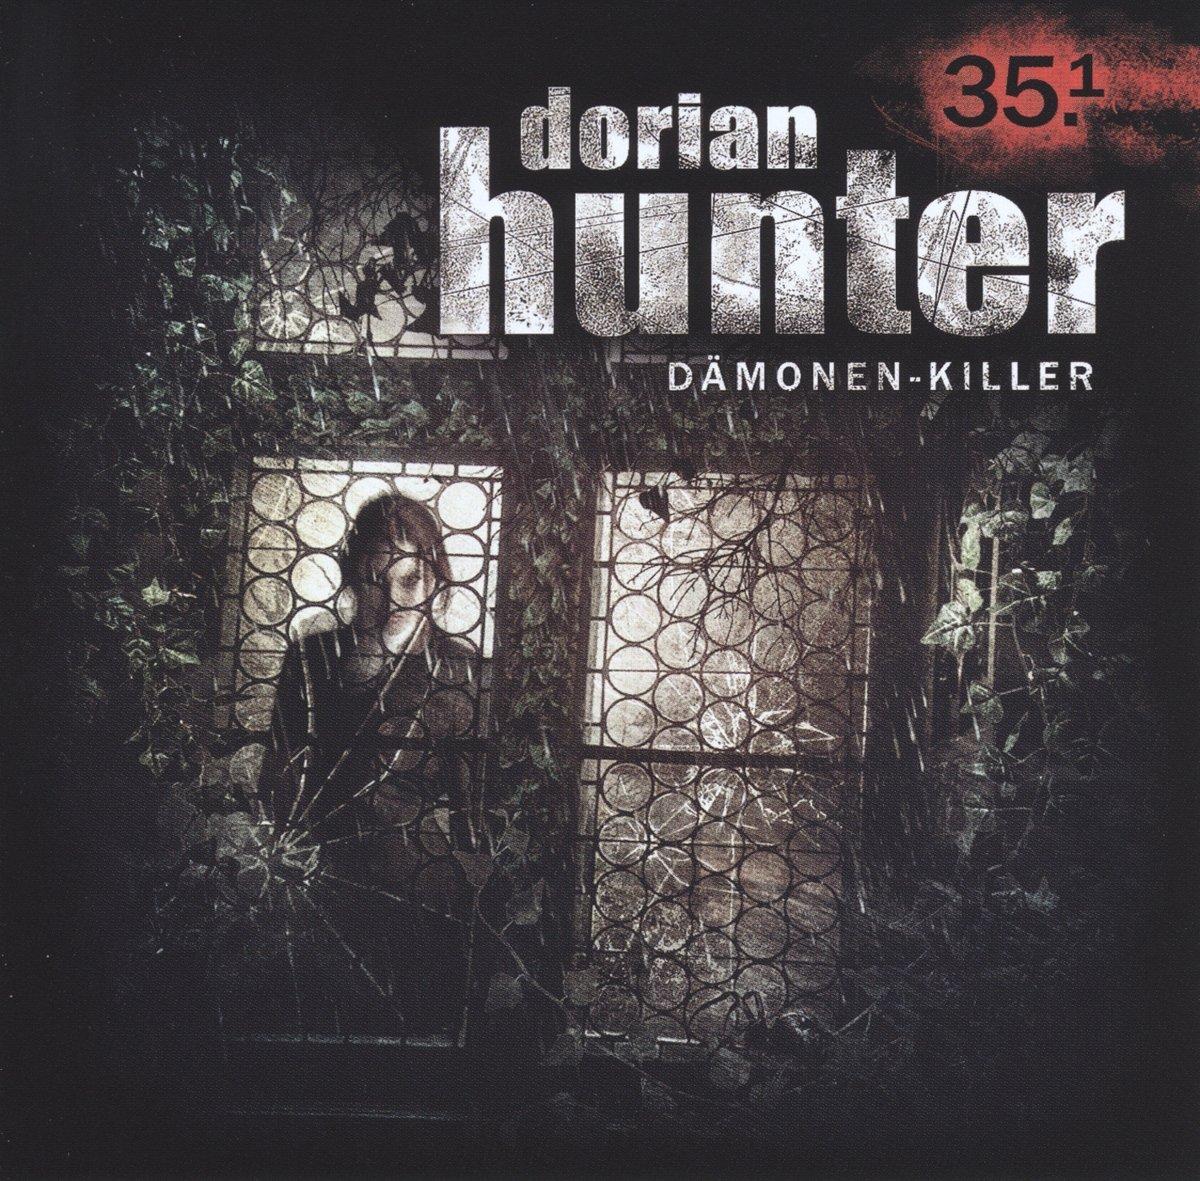 Dorian Hunter - Niemandsland. Eingeladen (Folge 35.1)